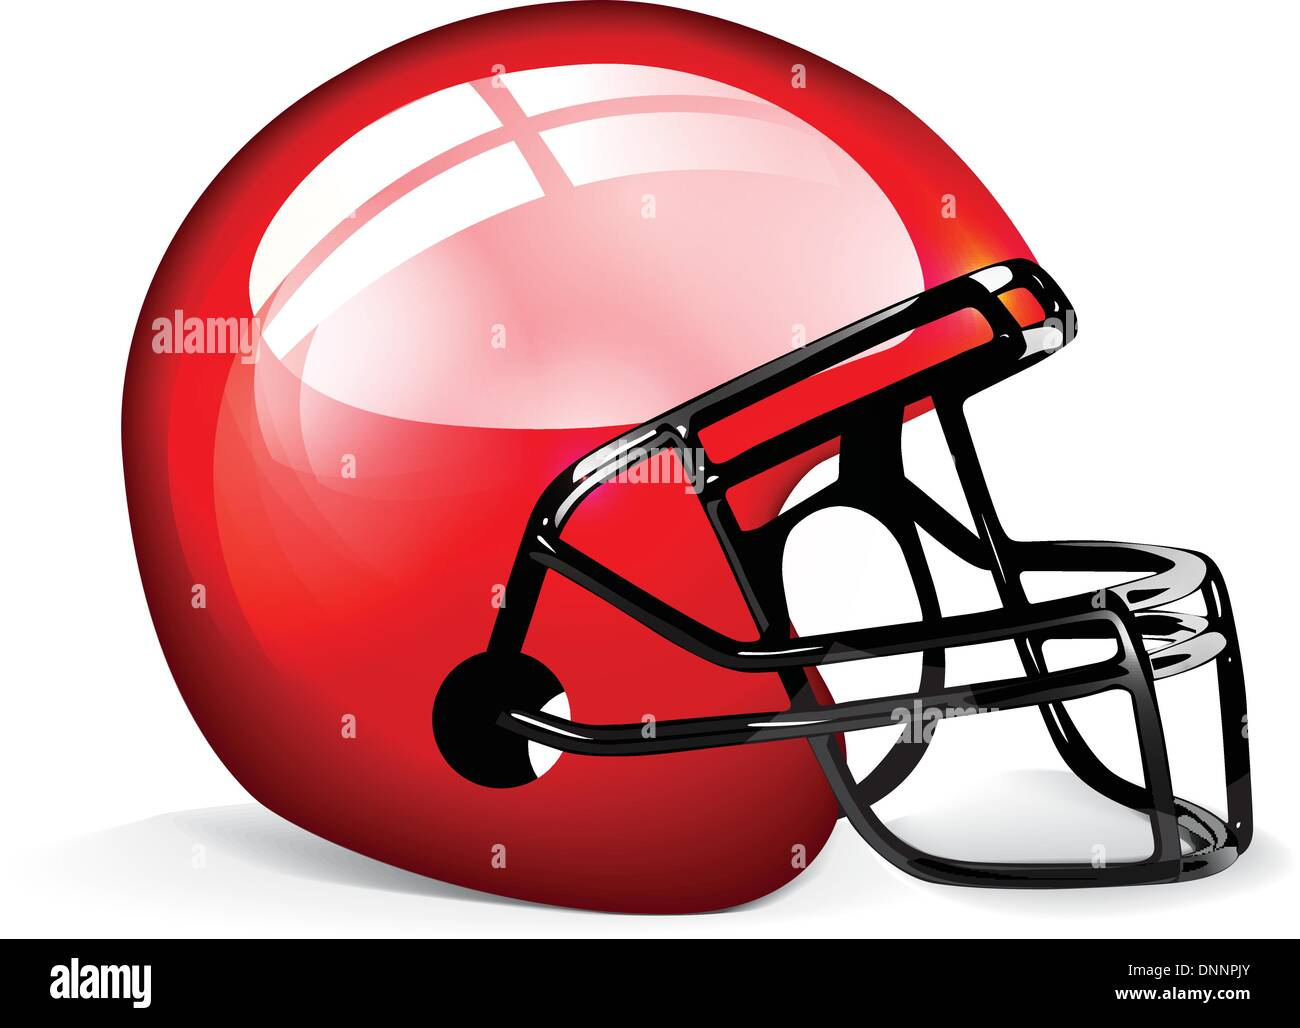 Football helmet rouge isolé sur fond blanc Photo Stock